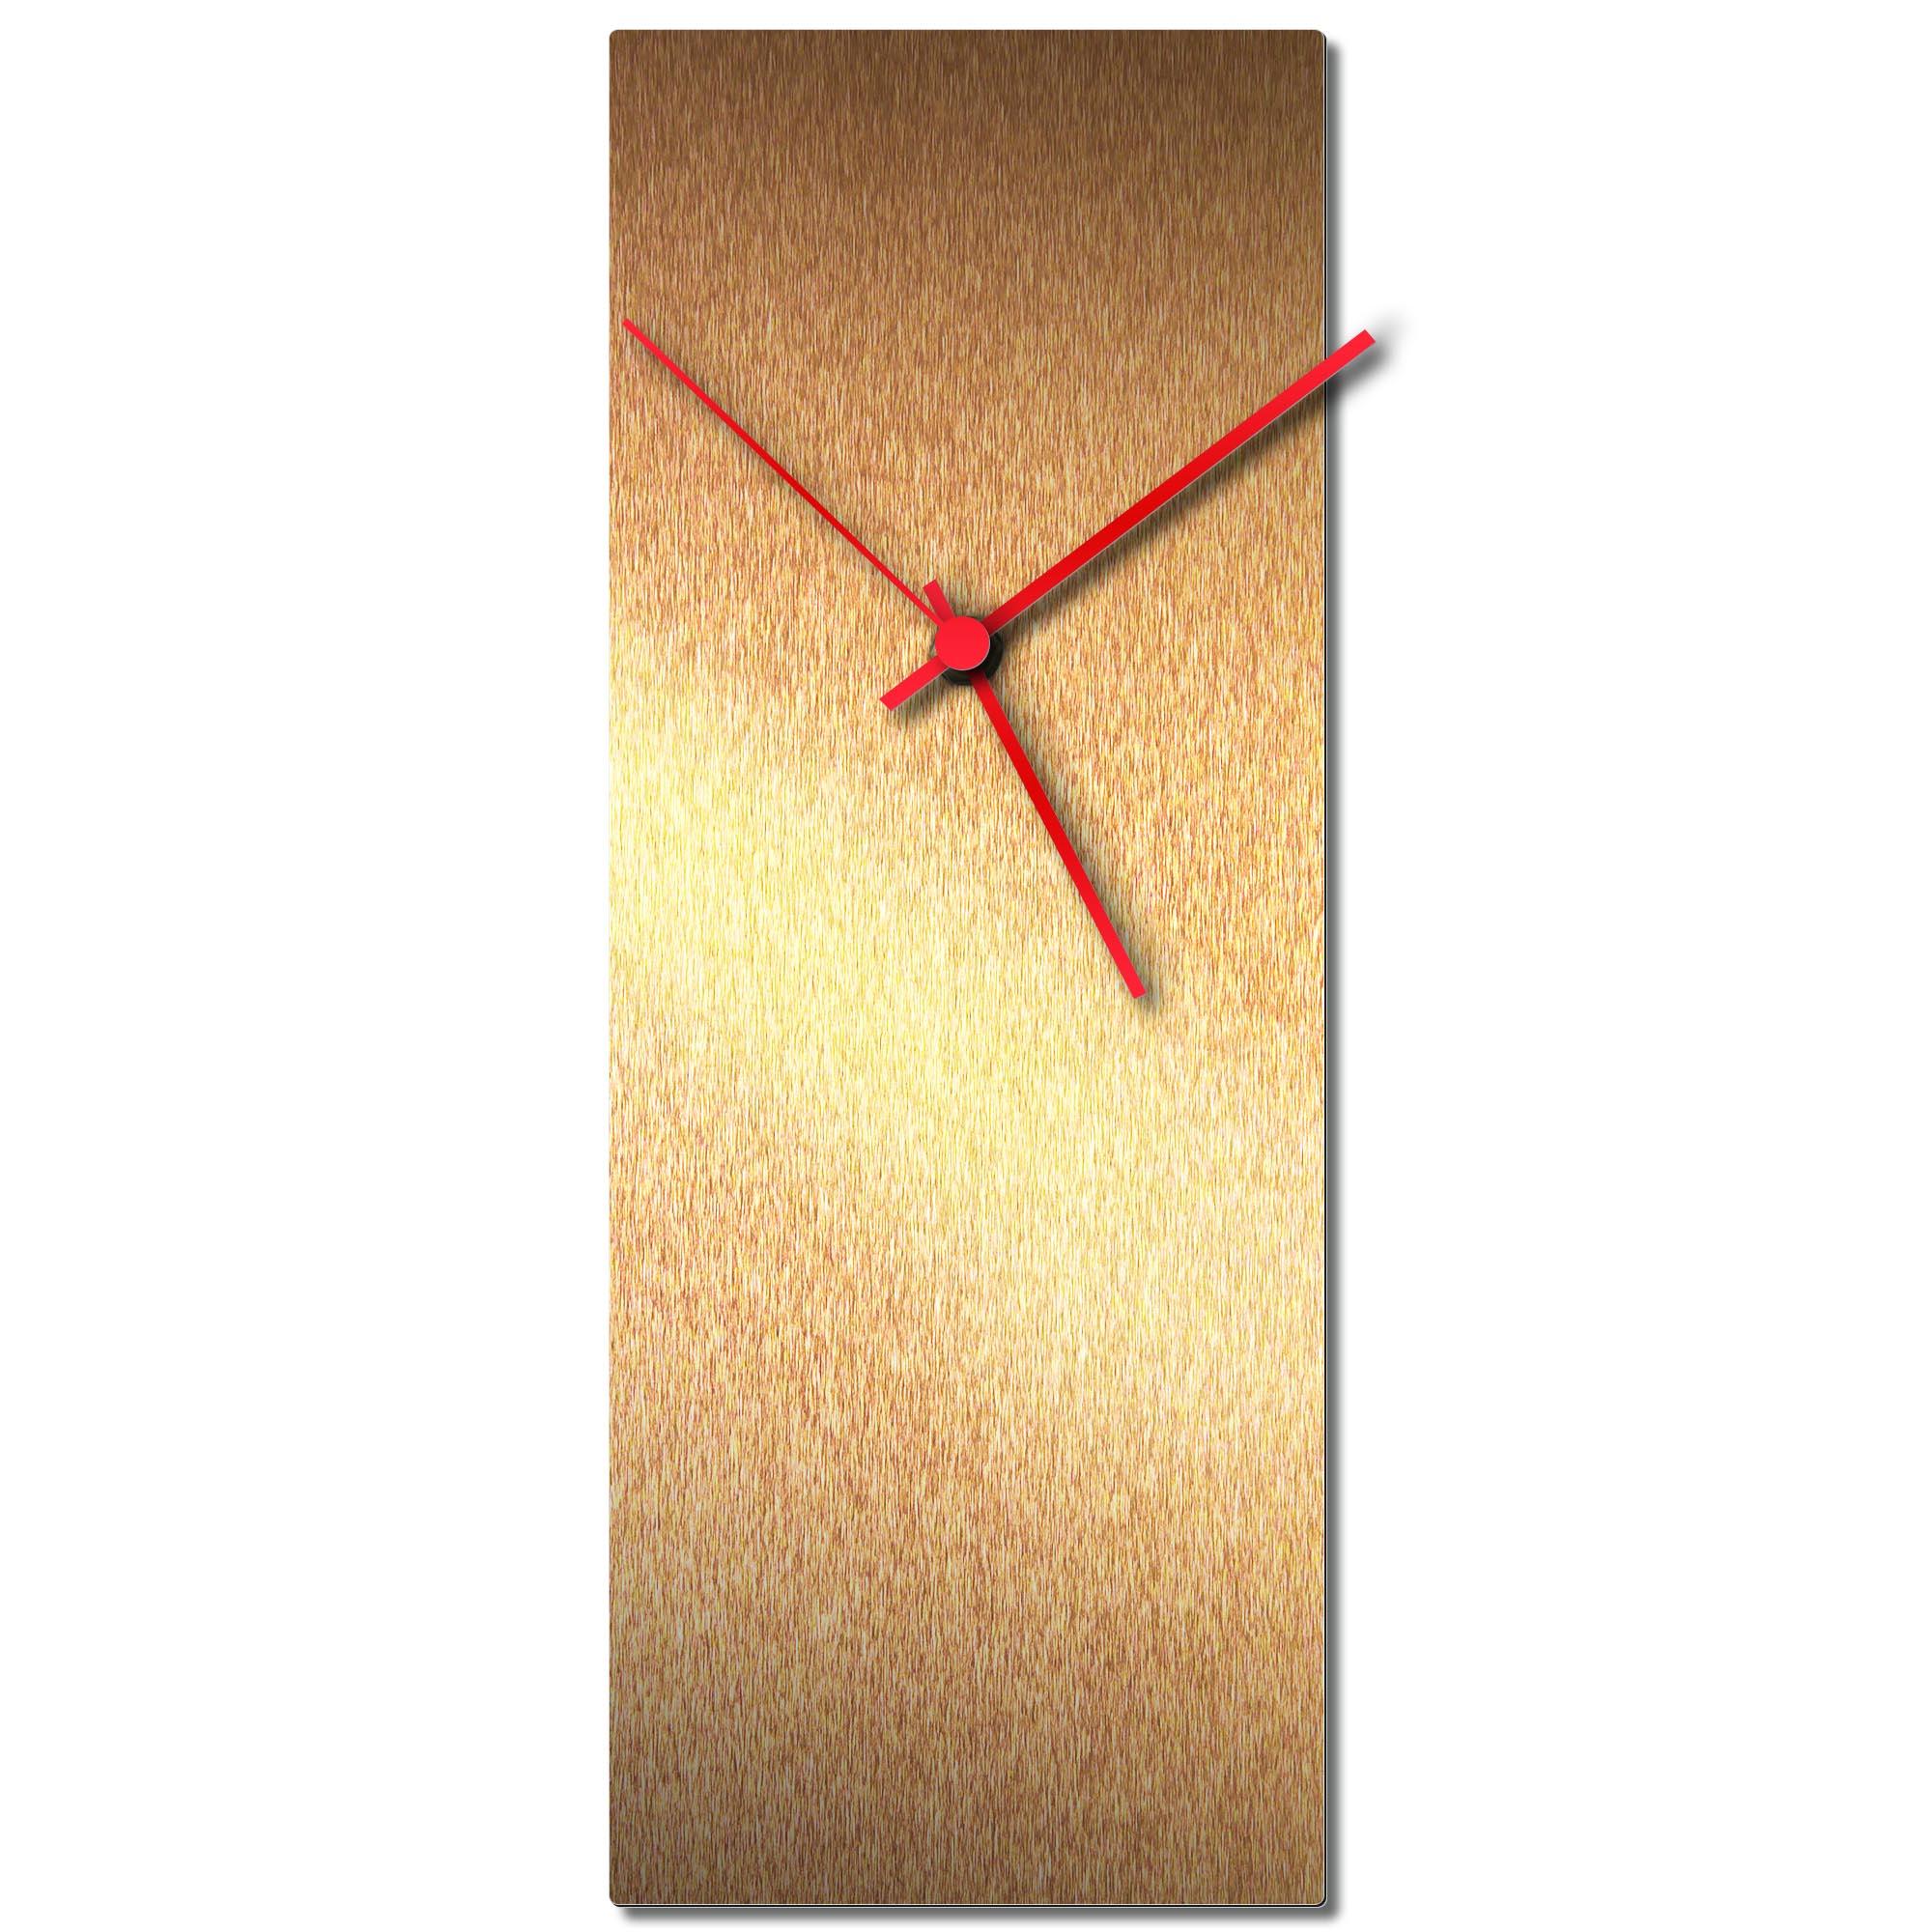 Adam Schwoeppe 'Bronzesmith Clock Large Red' Midcentury Modern Style Wall Clock